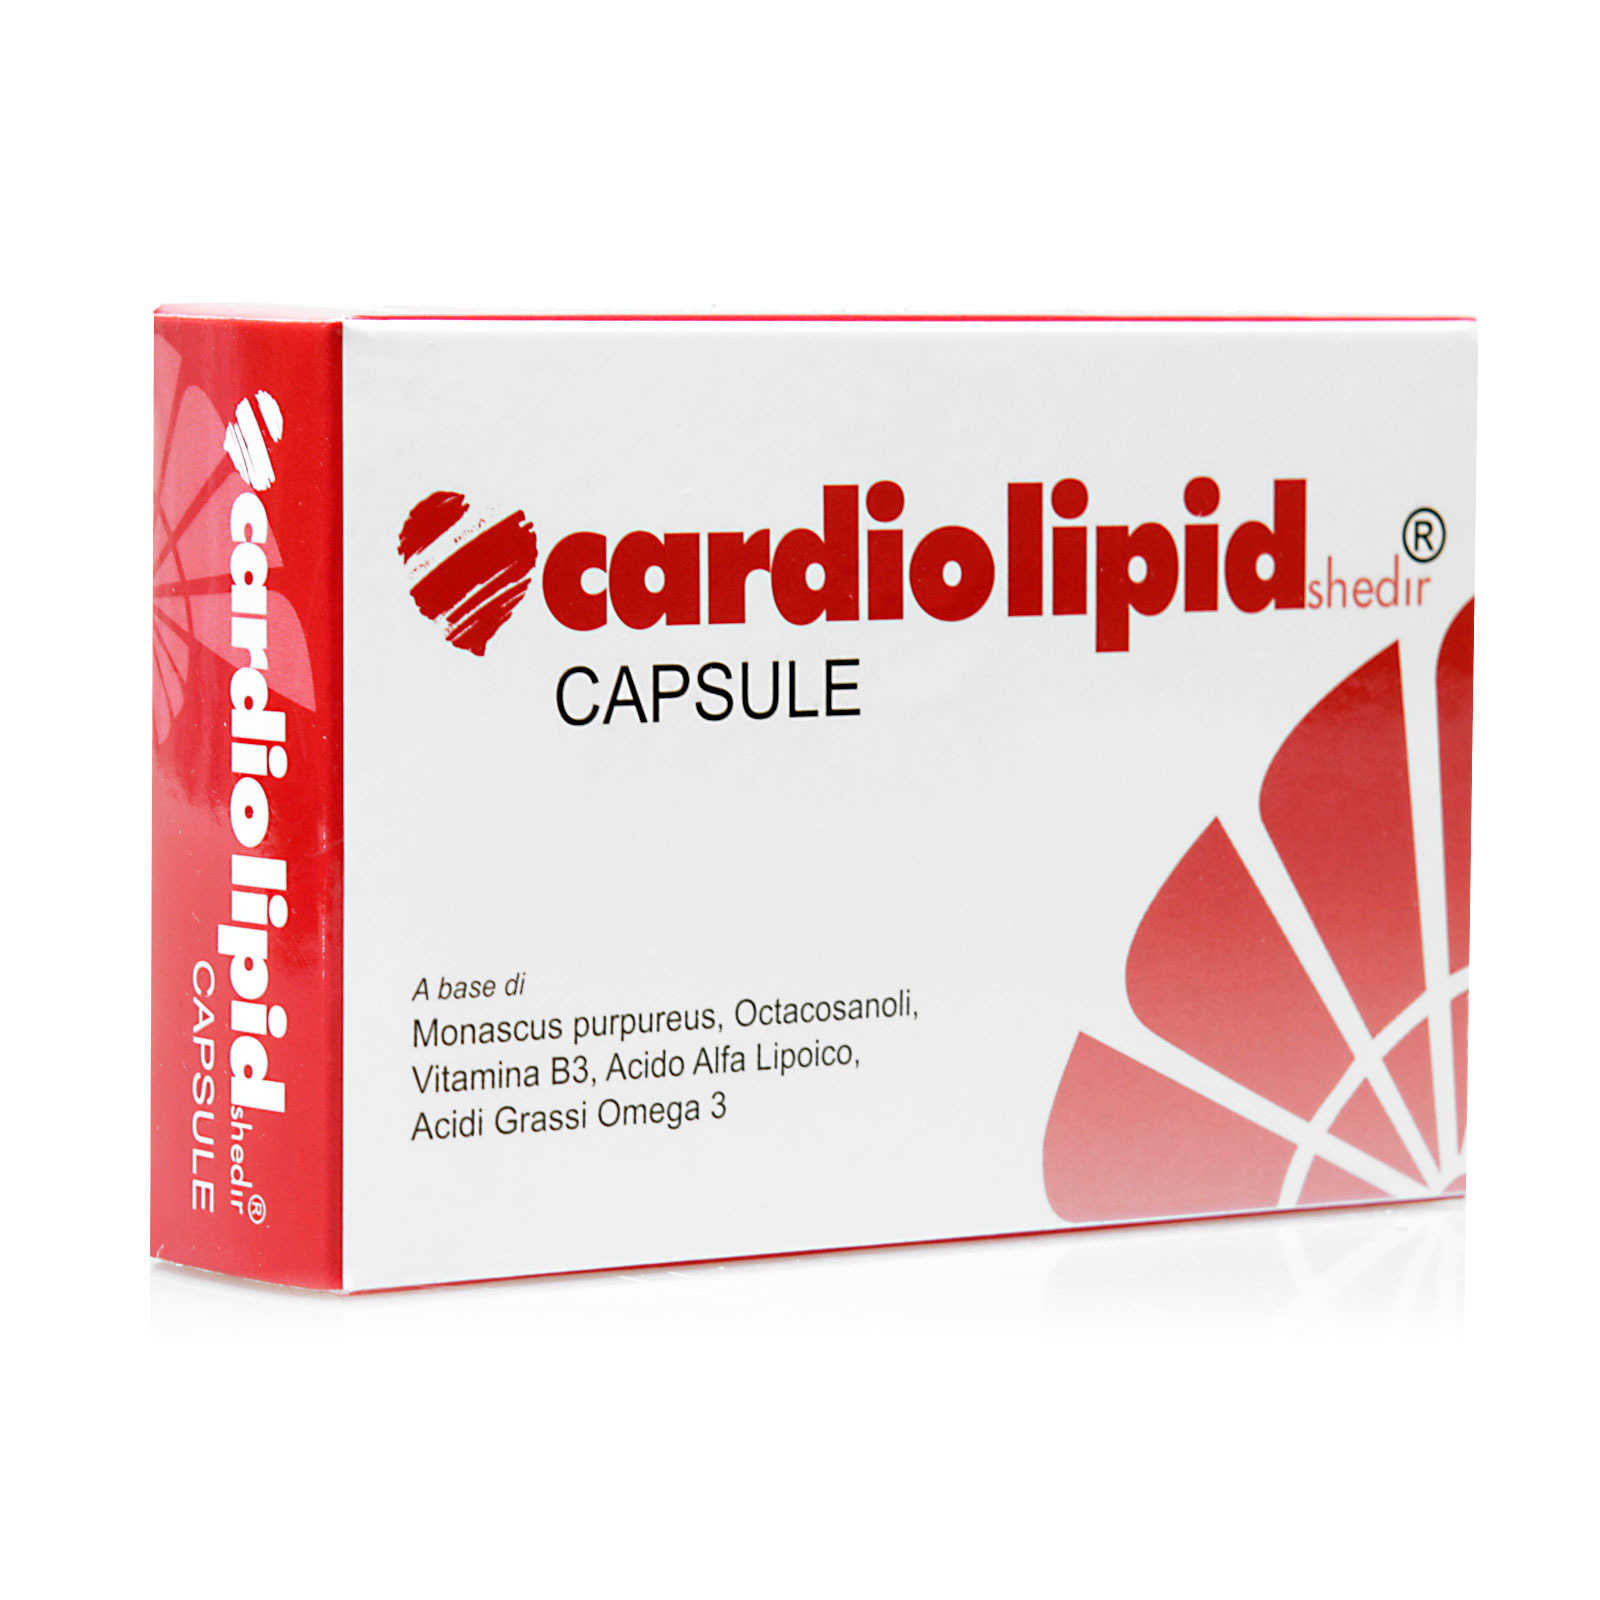 Shedir Pharma - Integratore alimentare con Omega3 - Cardiolipid Shedir